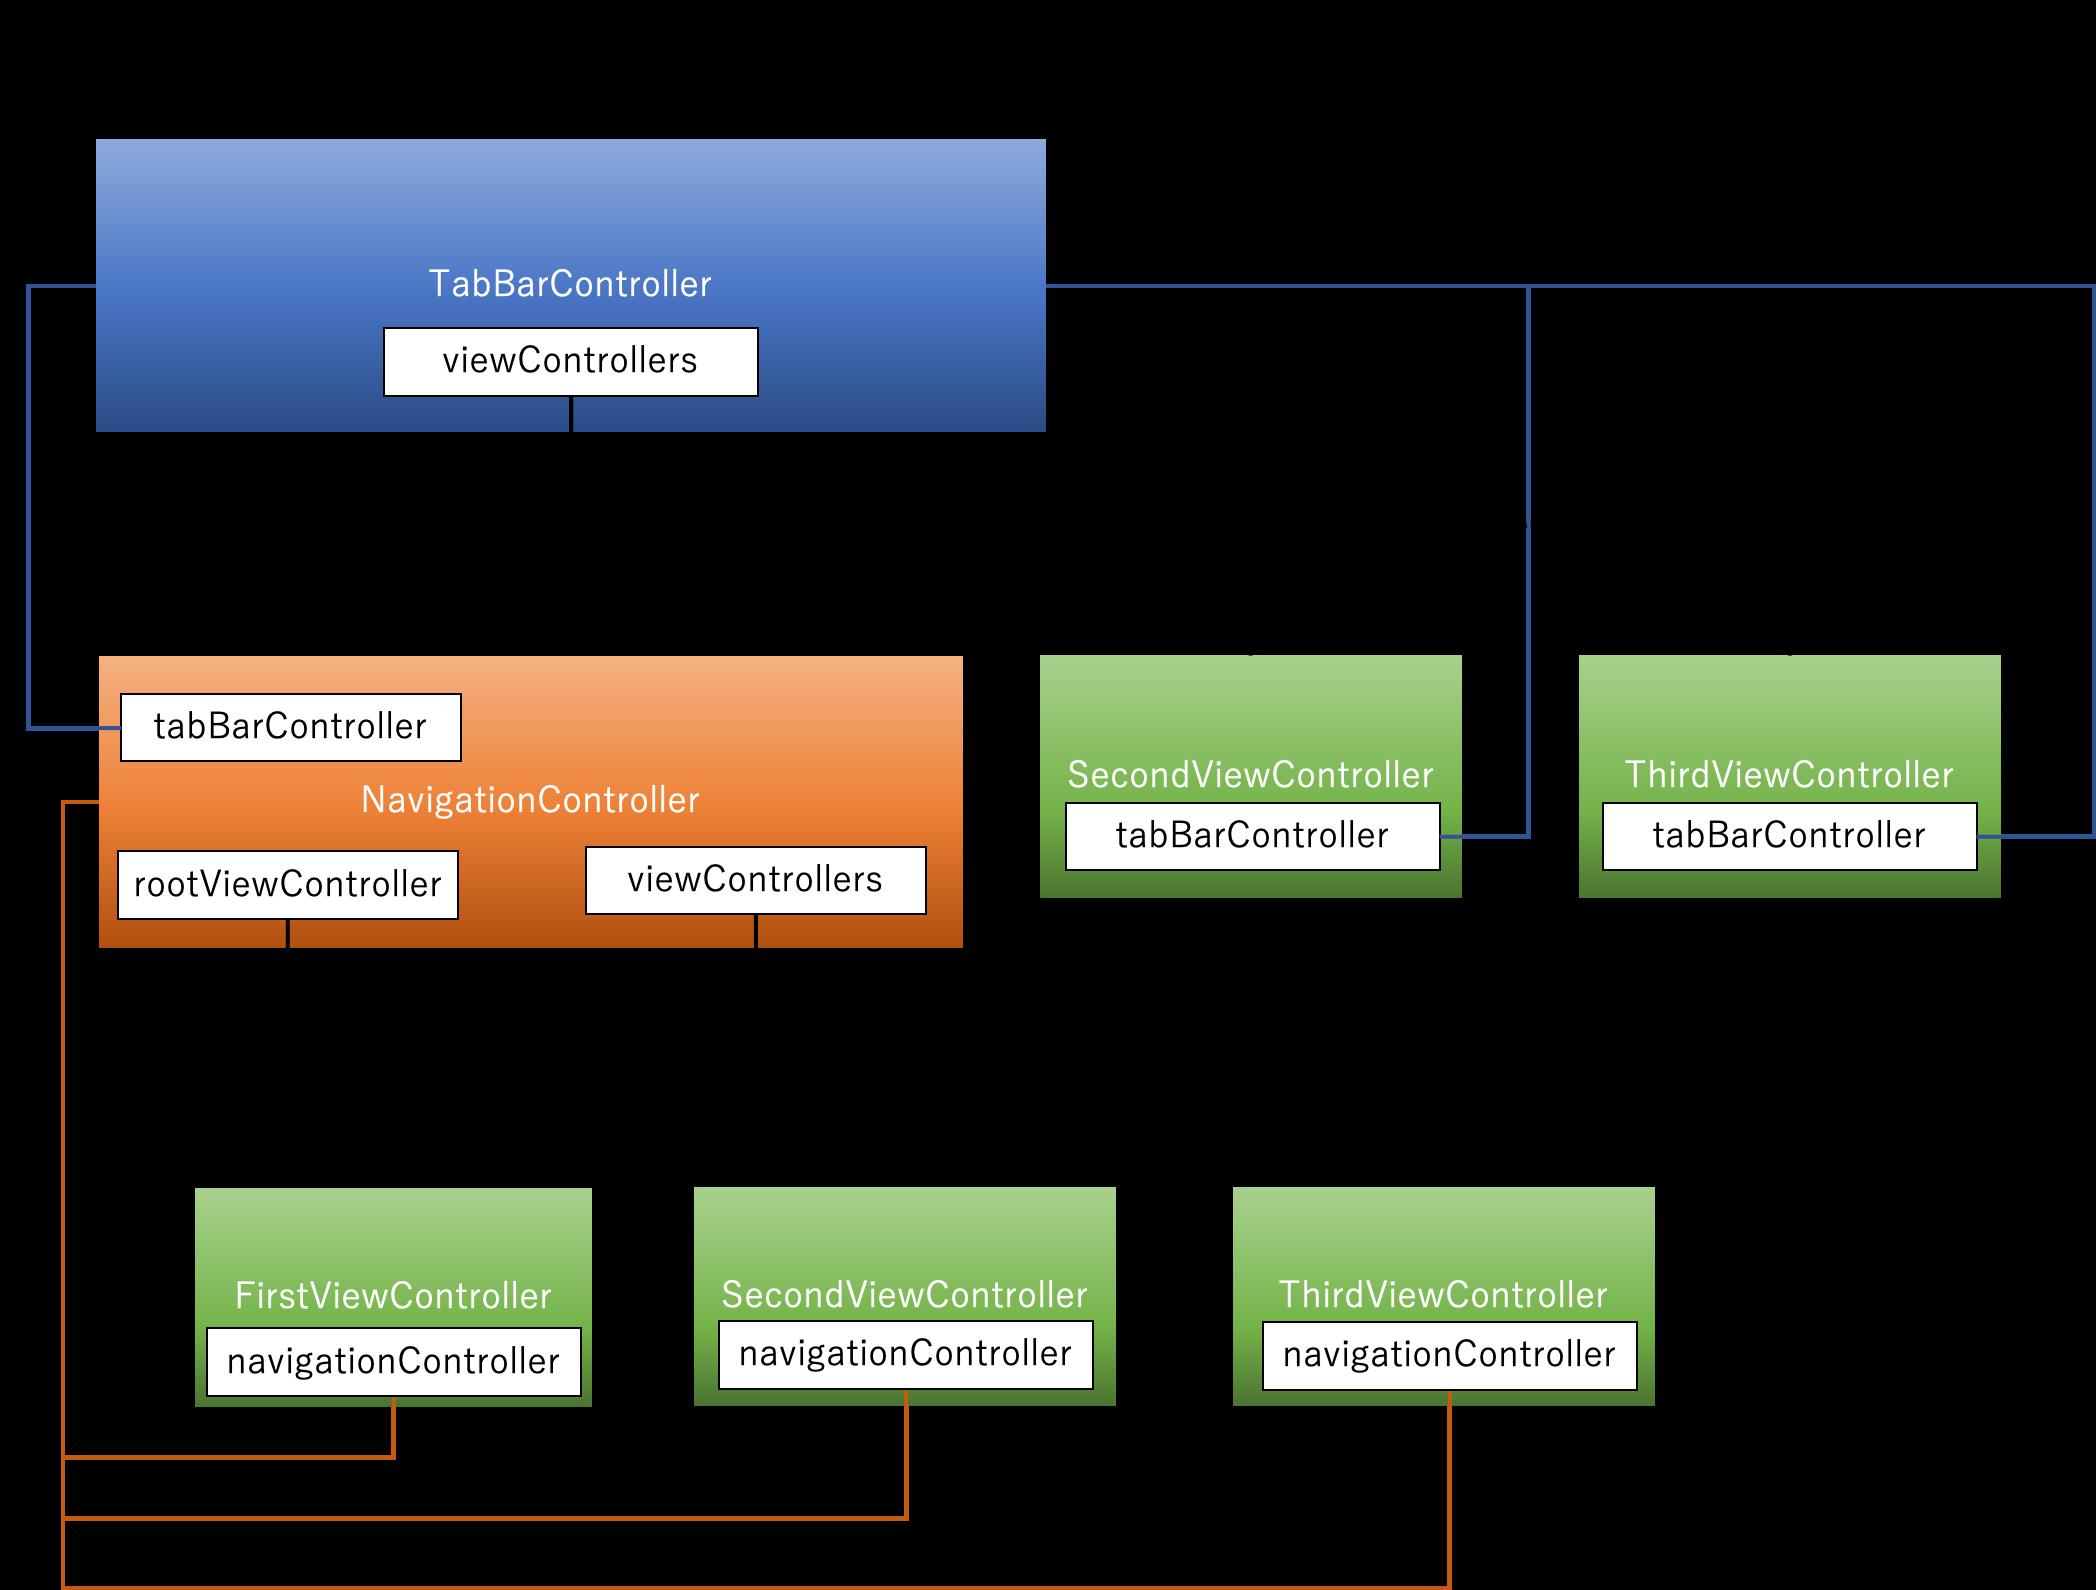 全体関係図.png